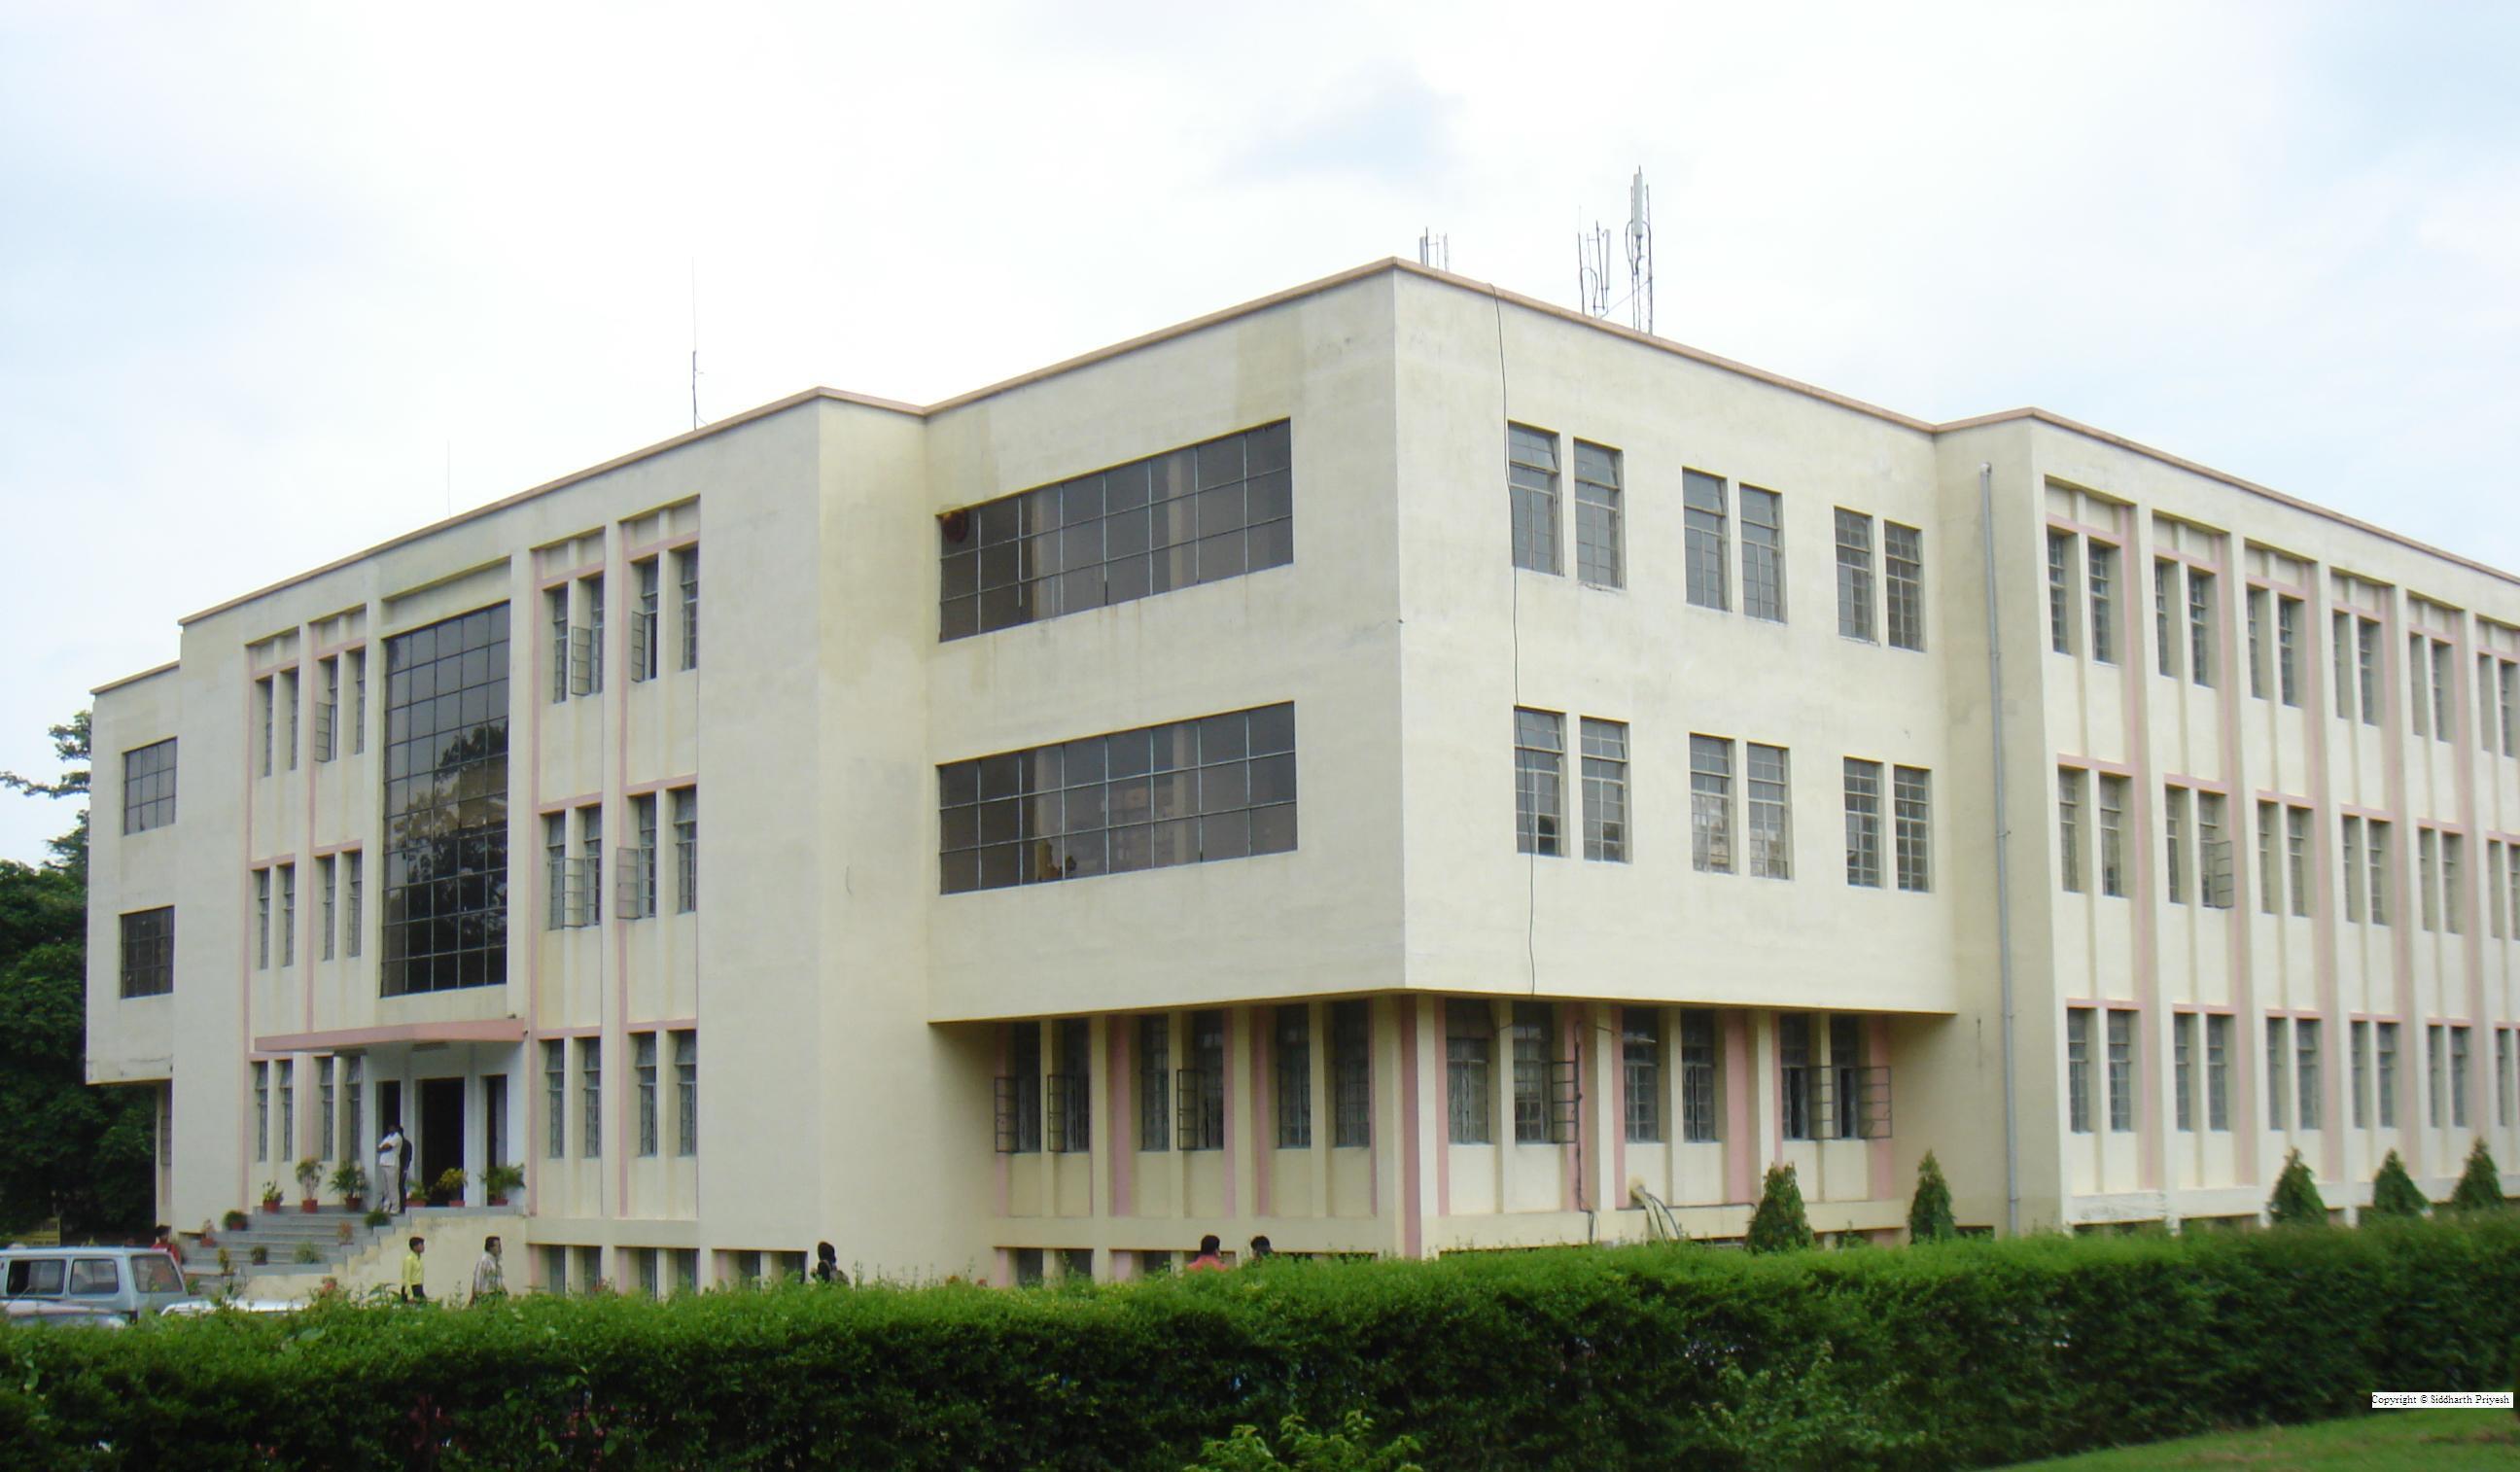 birla_institute_of_technology_mesra_off_campus_deoghar1.jpg